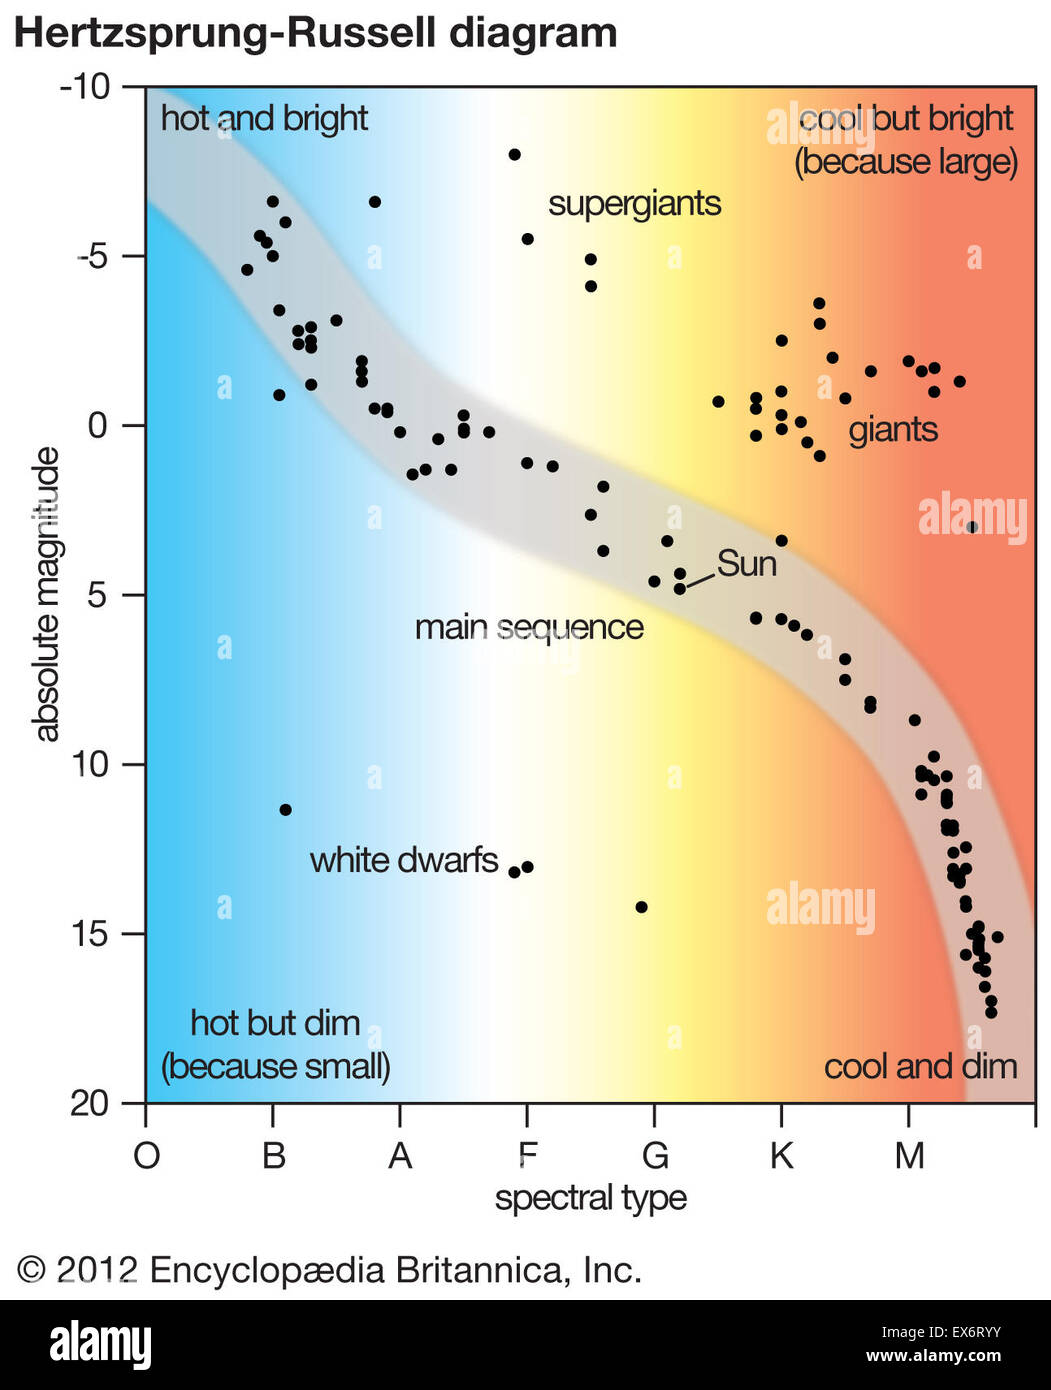 Hertzsprung Russell Diagram Stock Photo